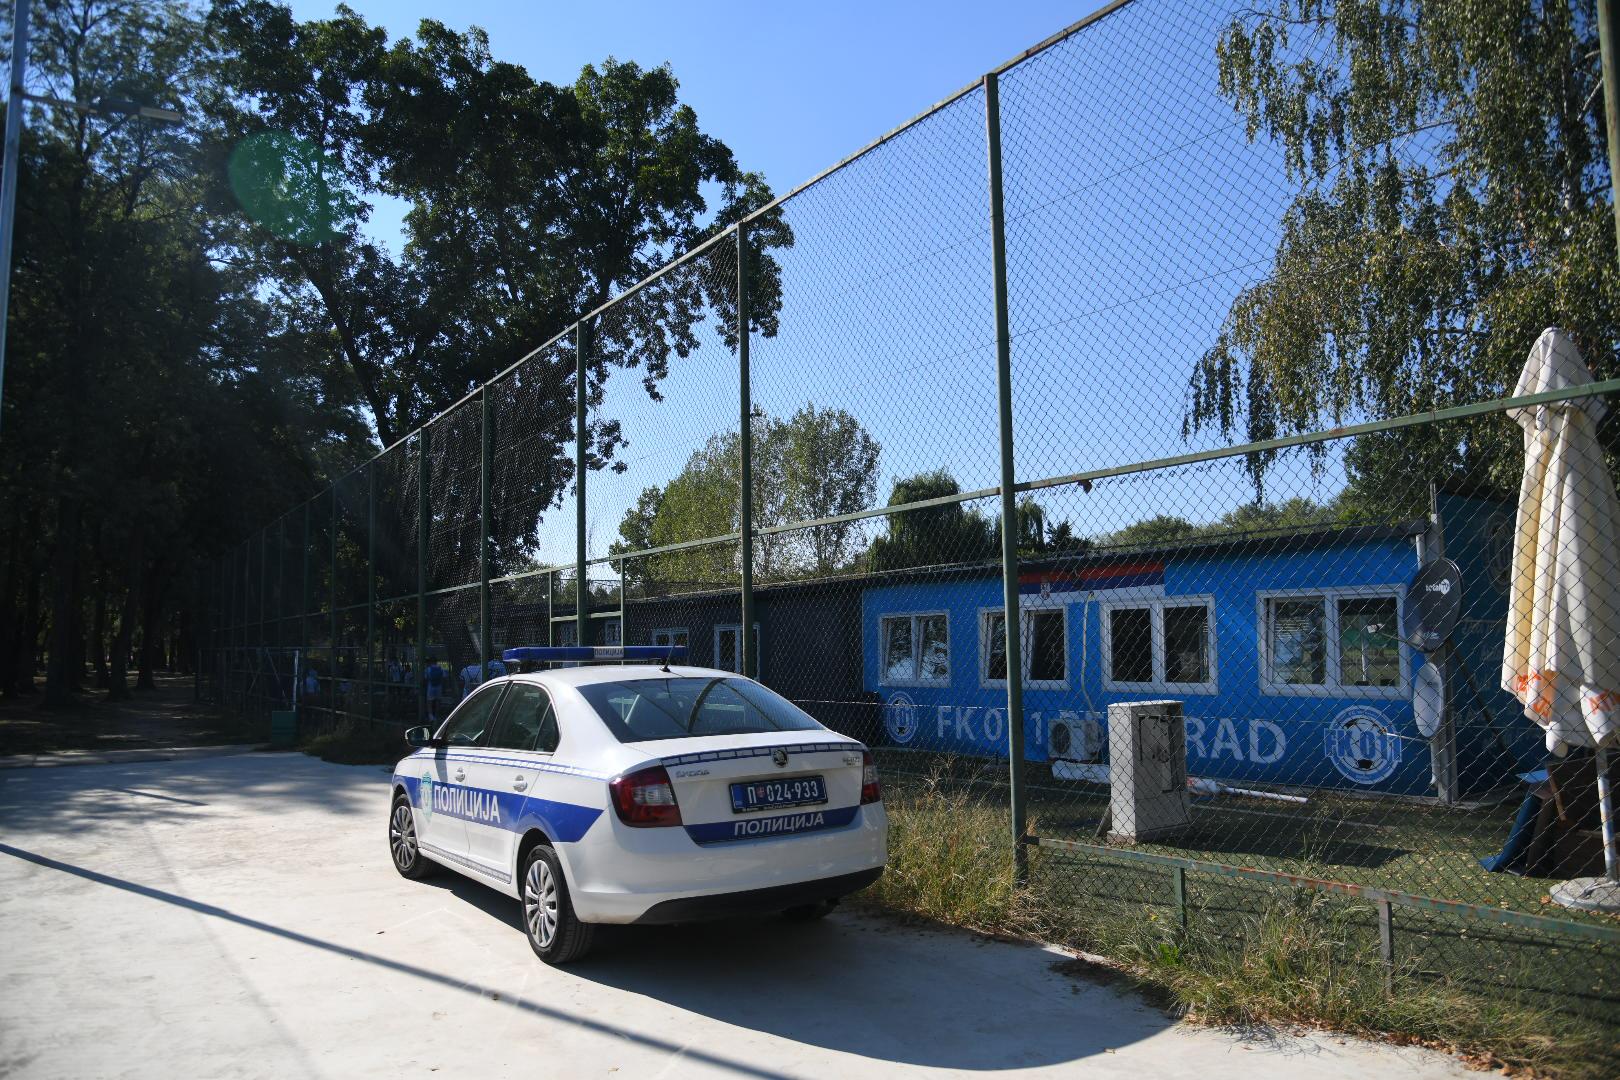 Ada Ciganlija, fudbal, fk 011 Beograd, fudbalski klub, preminuo dečak, umro dečak, utakmica